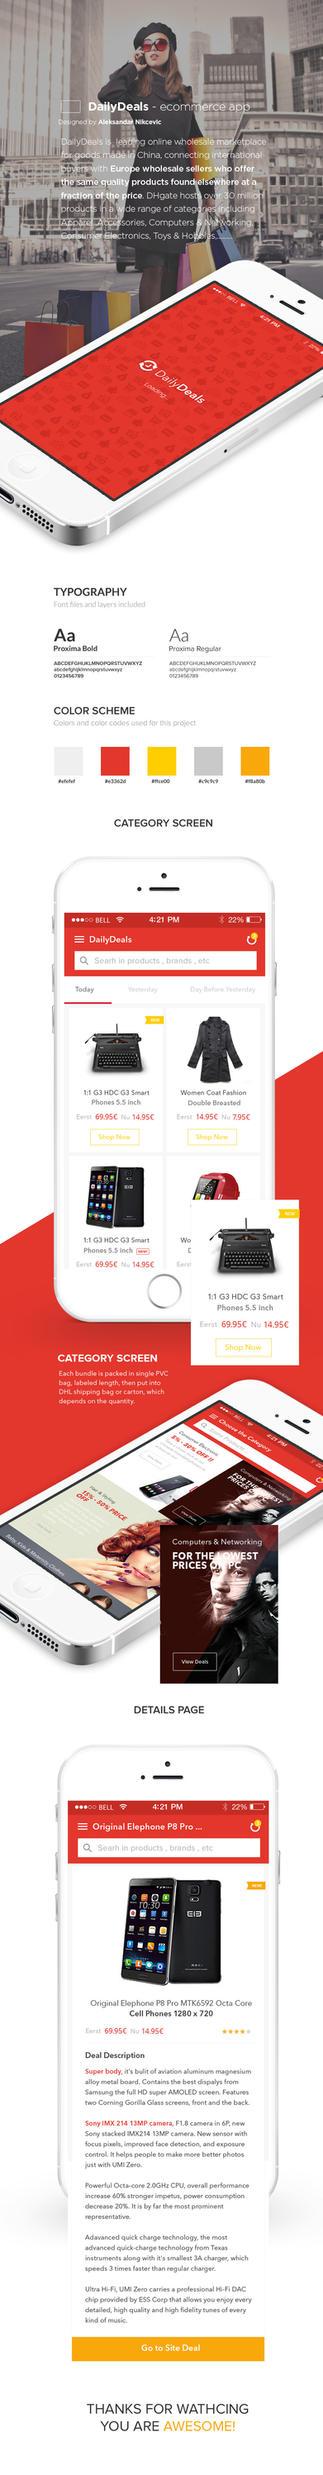 DailyDeals Ecommerce App Design by vasiligfx